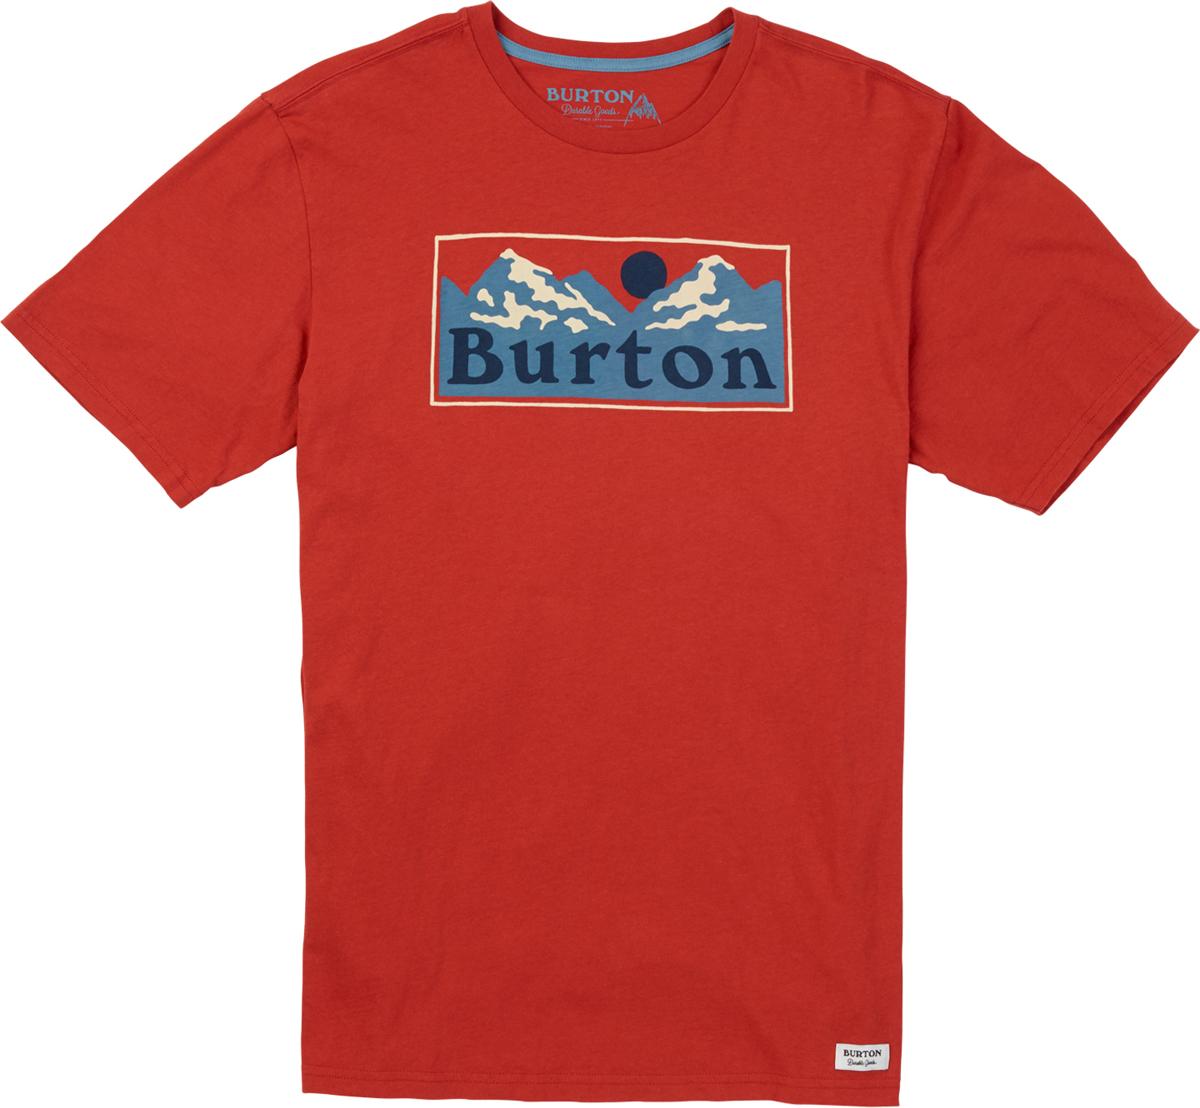 Футболка мужская Burton Mb Ralleye Ss, цвет: красный. 19691100600. Размер XL (52) burton термобелье burton midweight base layer pant true black fw18 xl